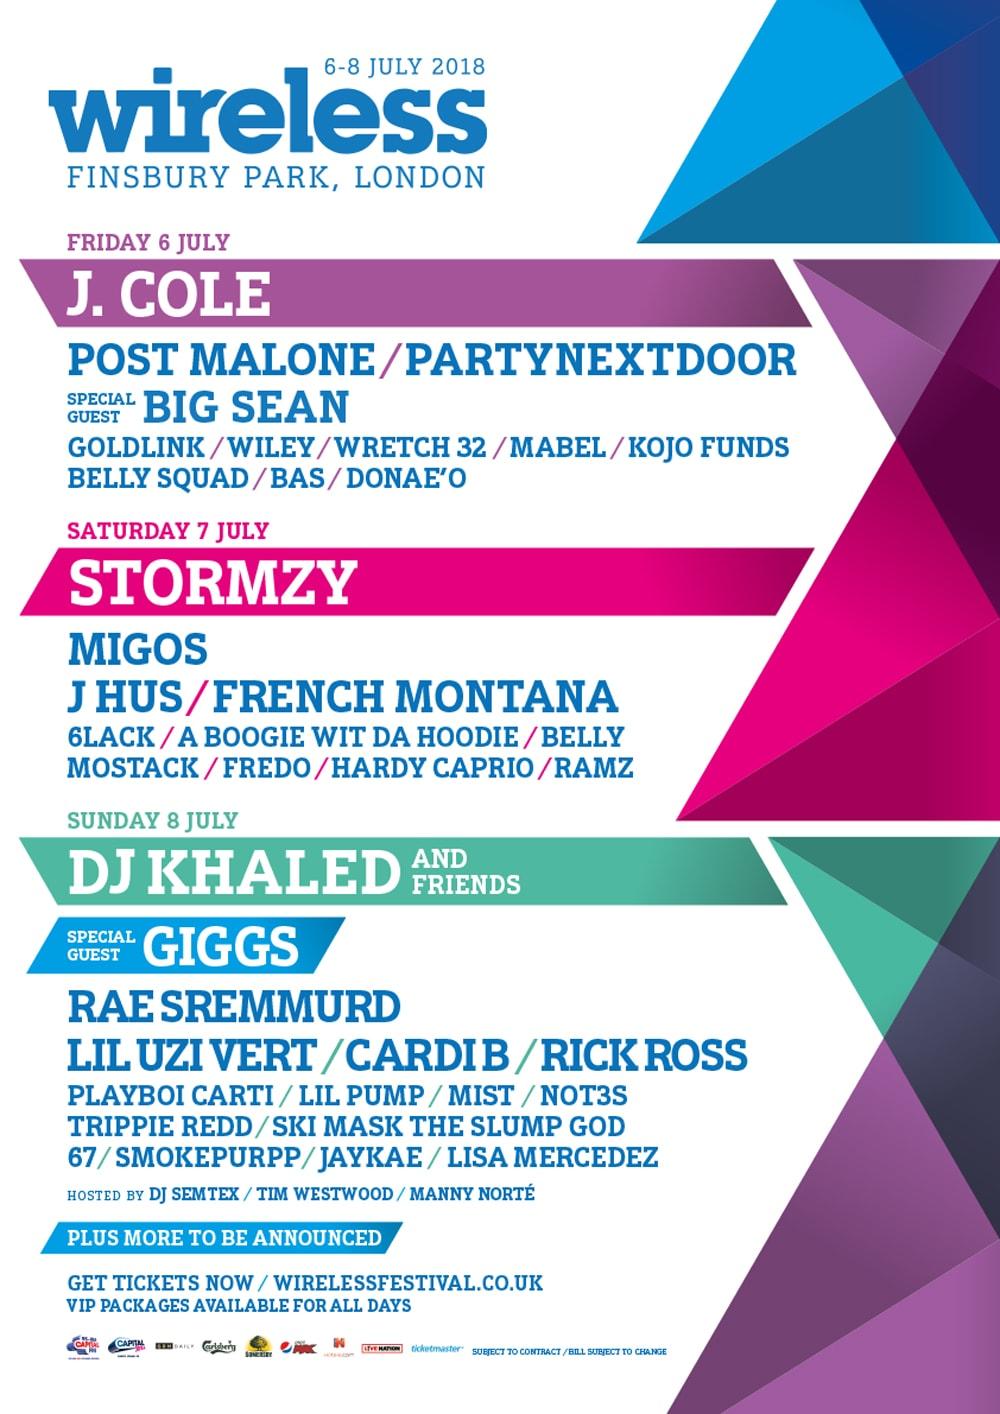 Post Malone Cardi B Migos Lil Uzi Vert Lil Pump J Hus Wiley Wireless Festival 2018 The Weeknd Skepta London